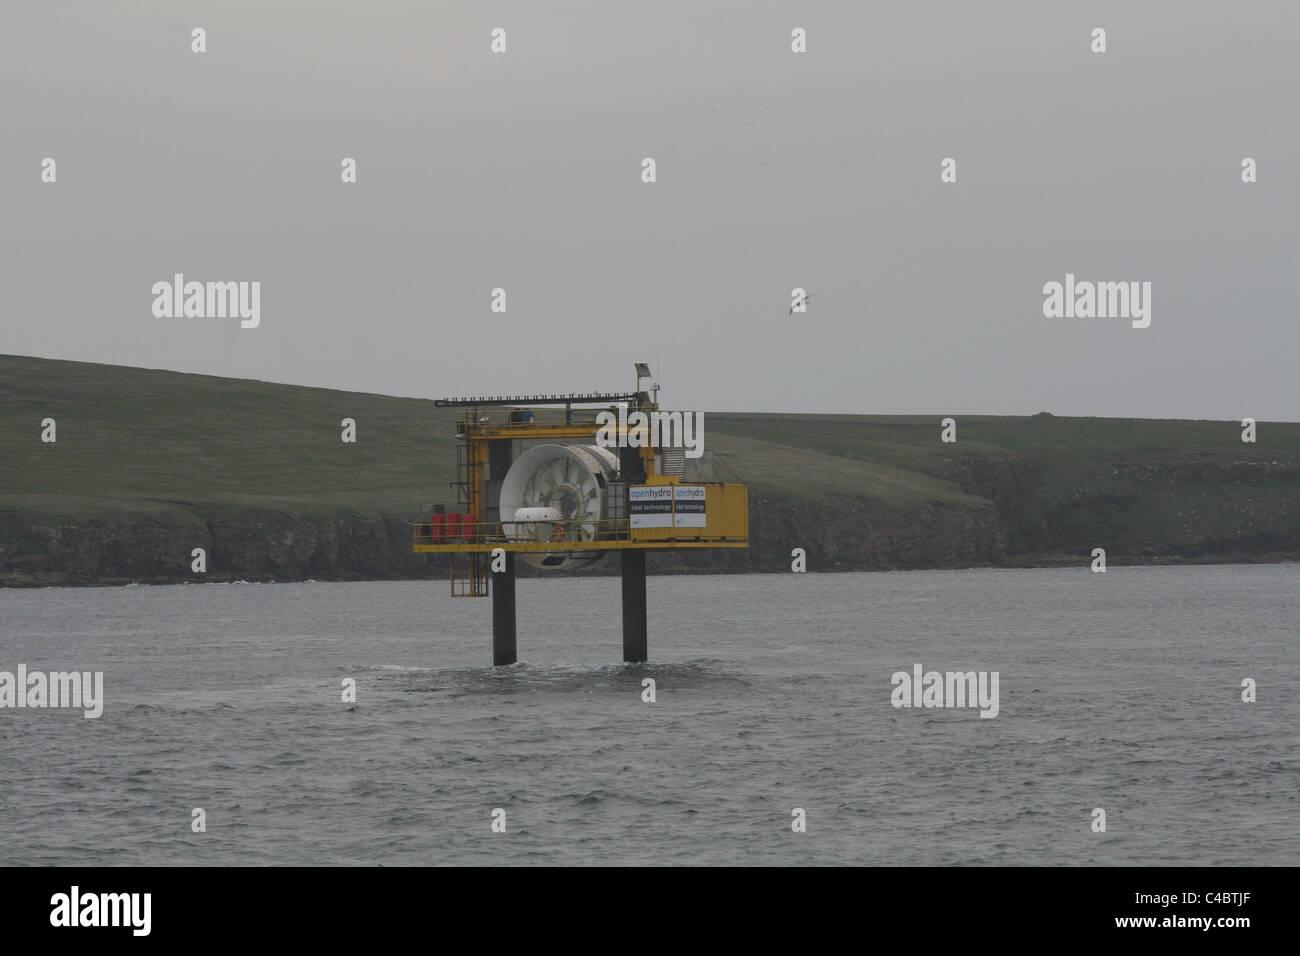 Open Hydro Tidal Turbine Stock Photos & Open Hydro Tidal